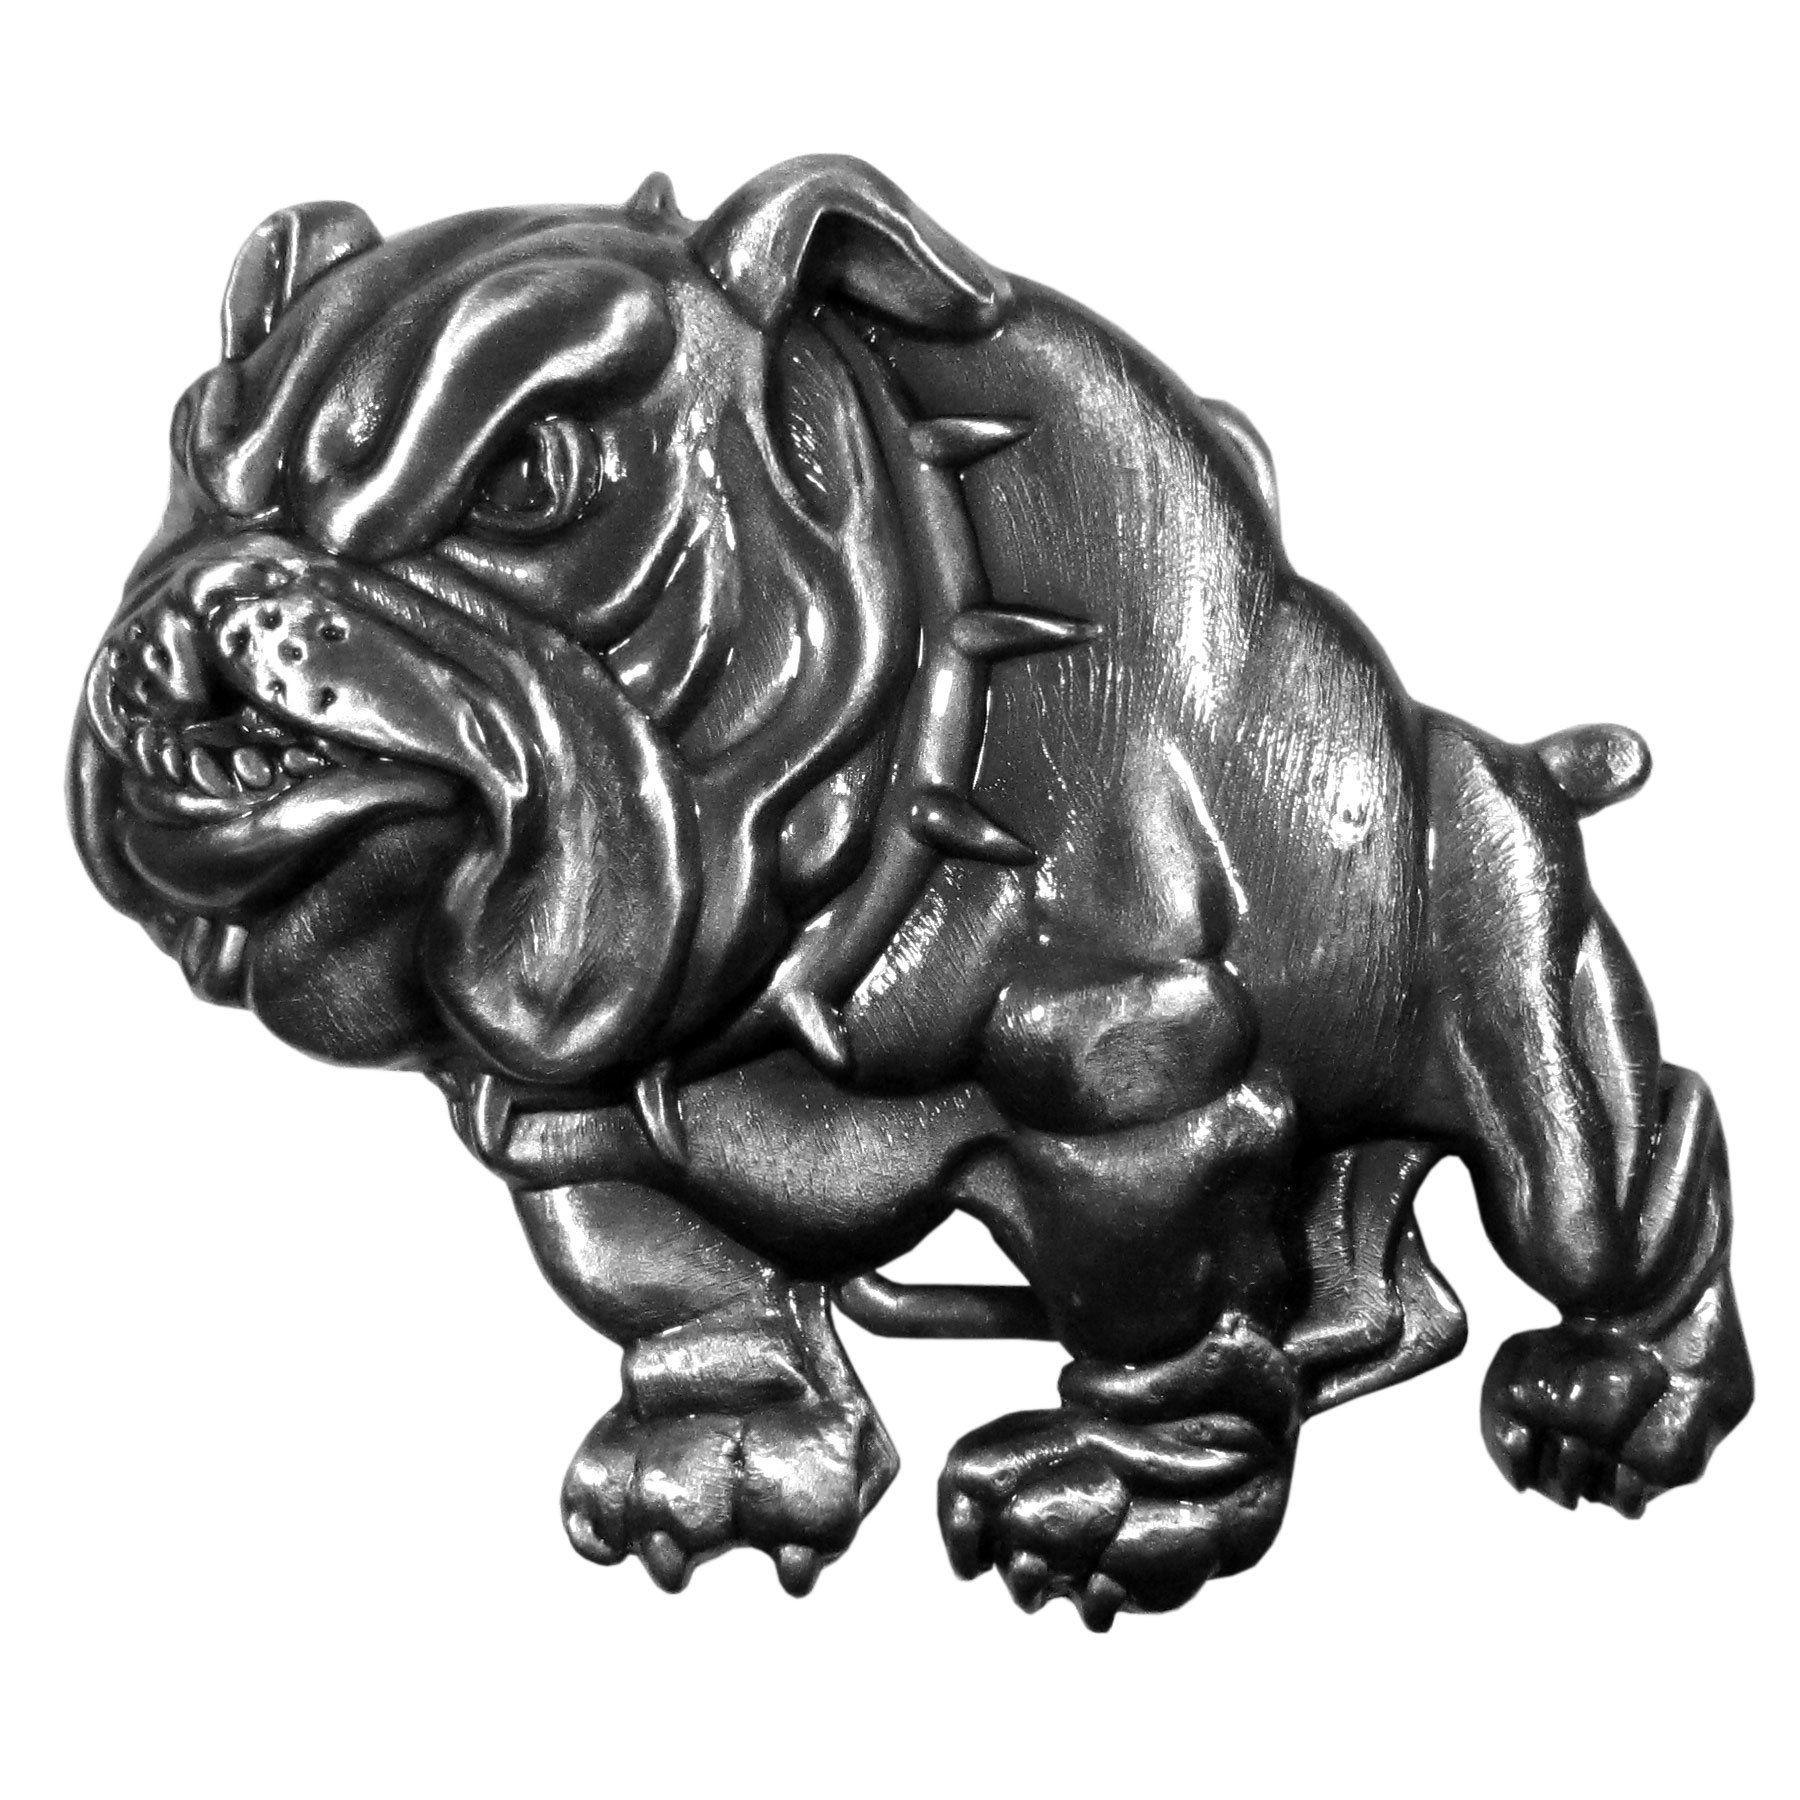 Bulldog Dog Belt Buckle Man Accessory Southwestern Silver for Leather Belt